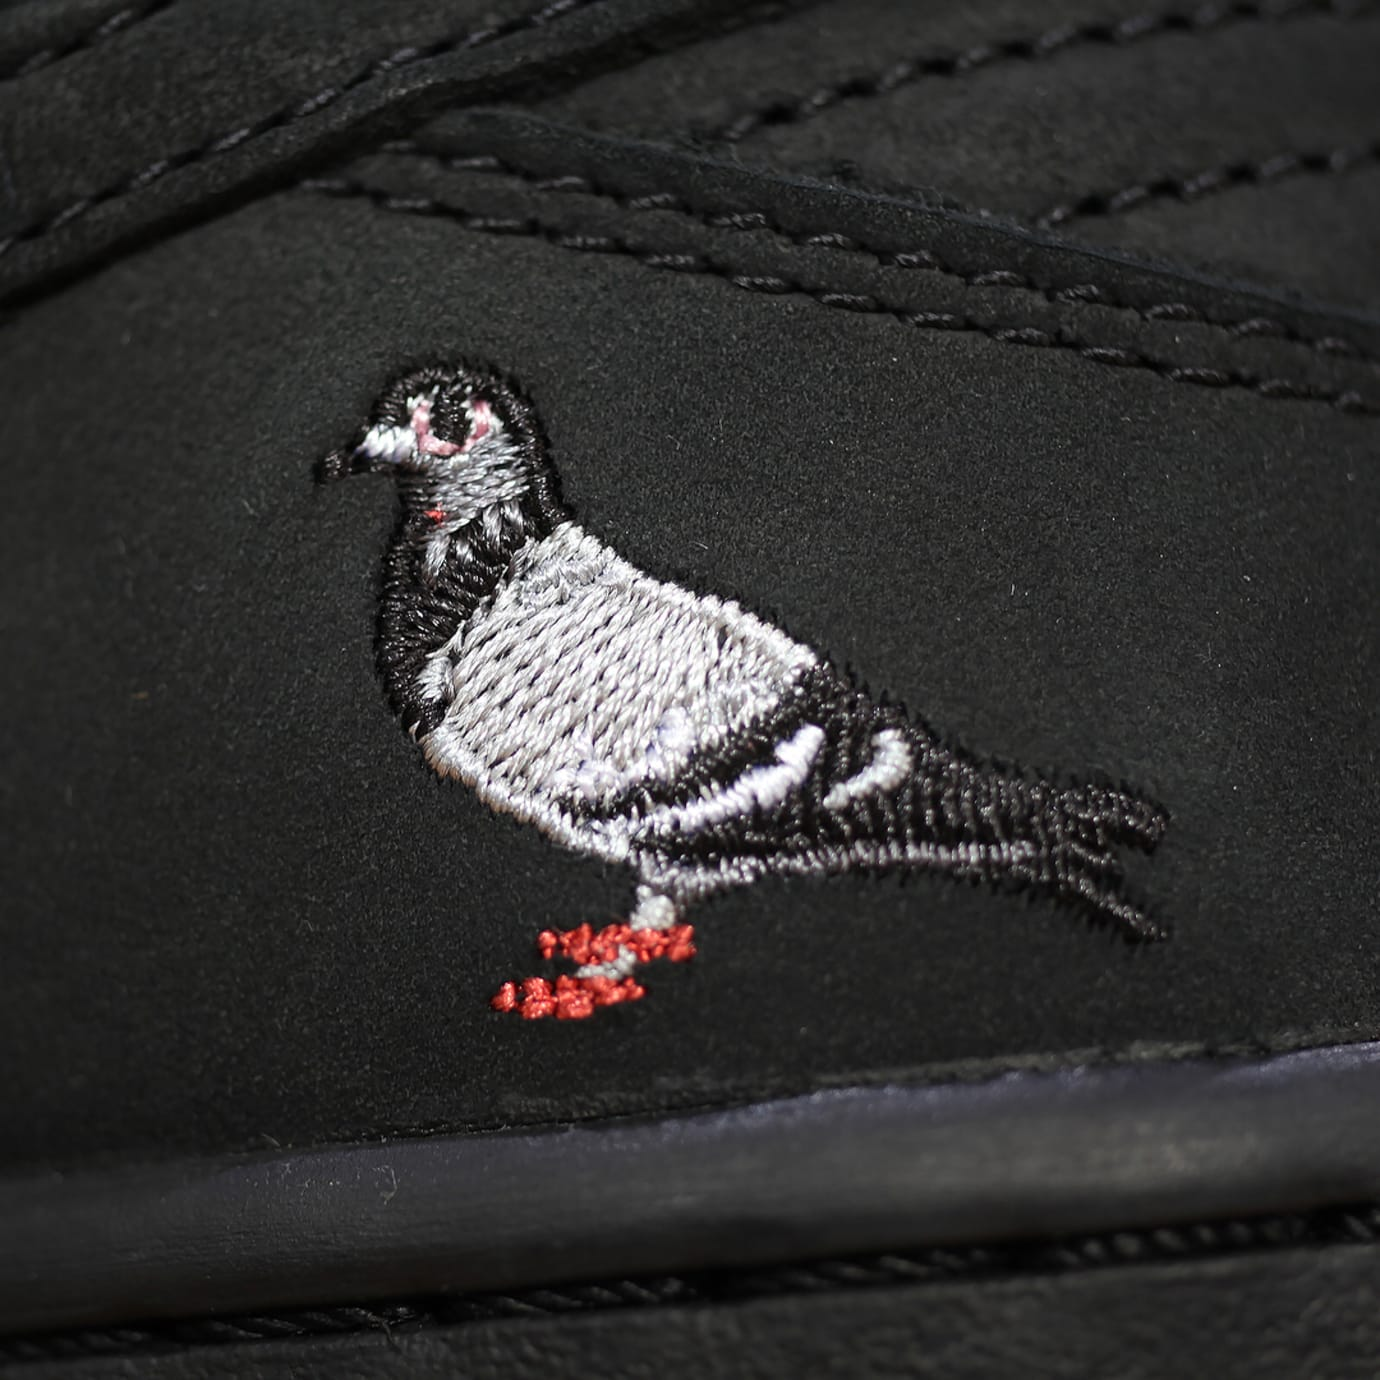 Nike SB Dunk Low Black Pigeon Release Date 88323-008 (9)